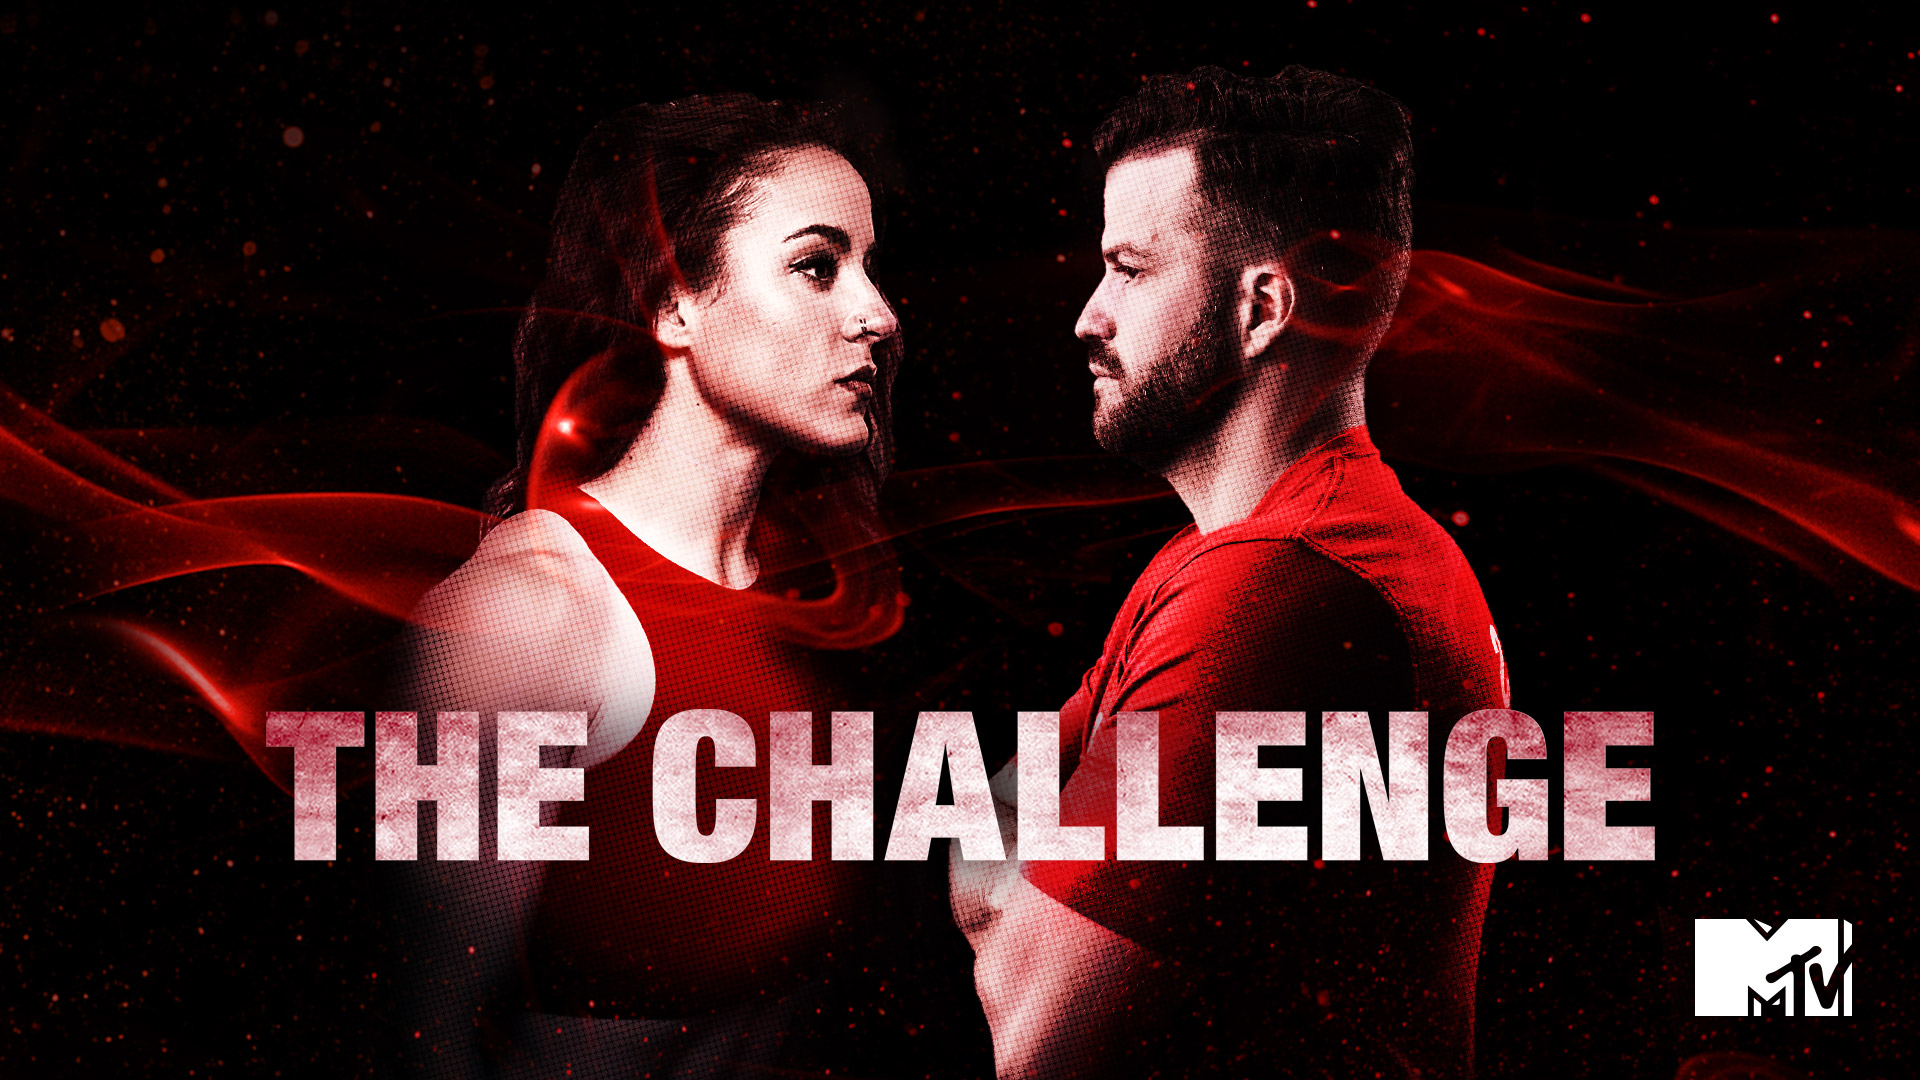 The Challenge Season 11